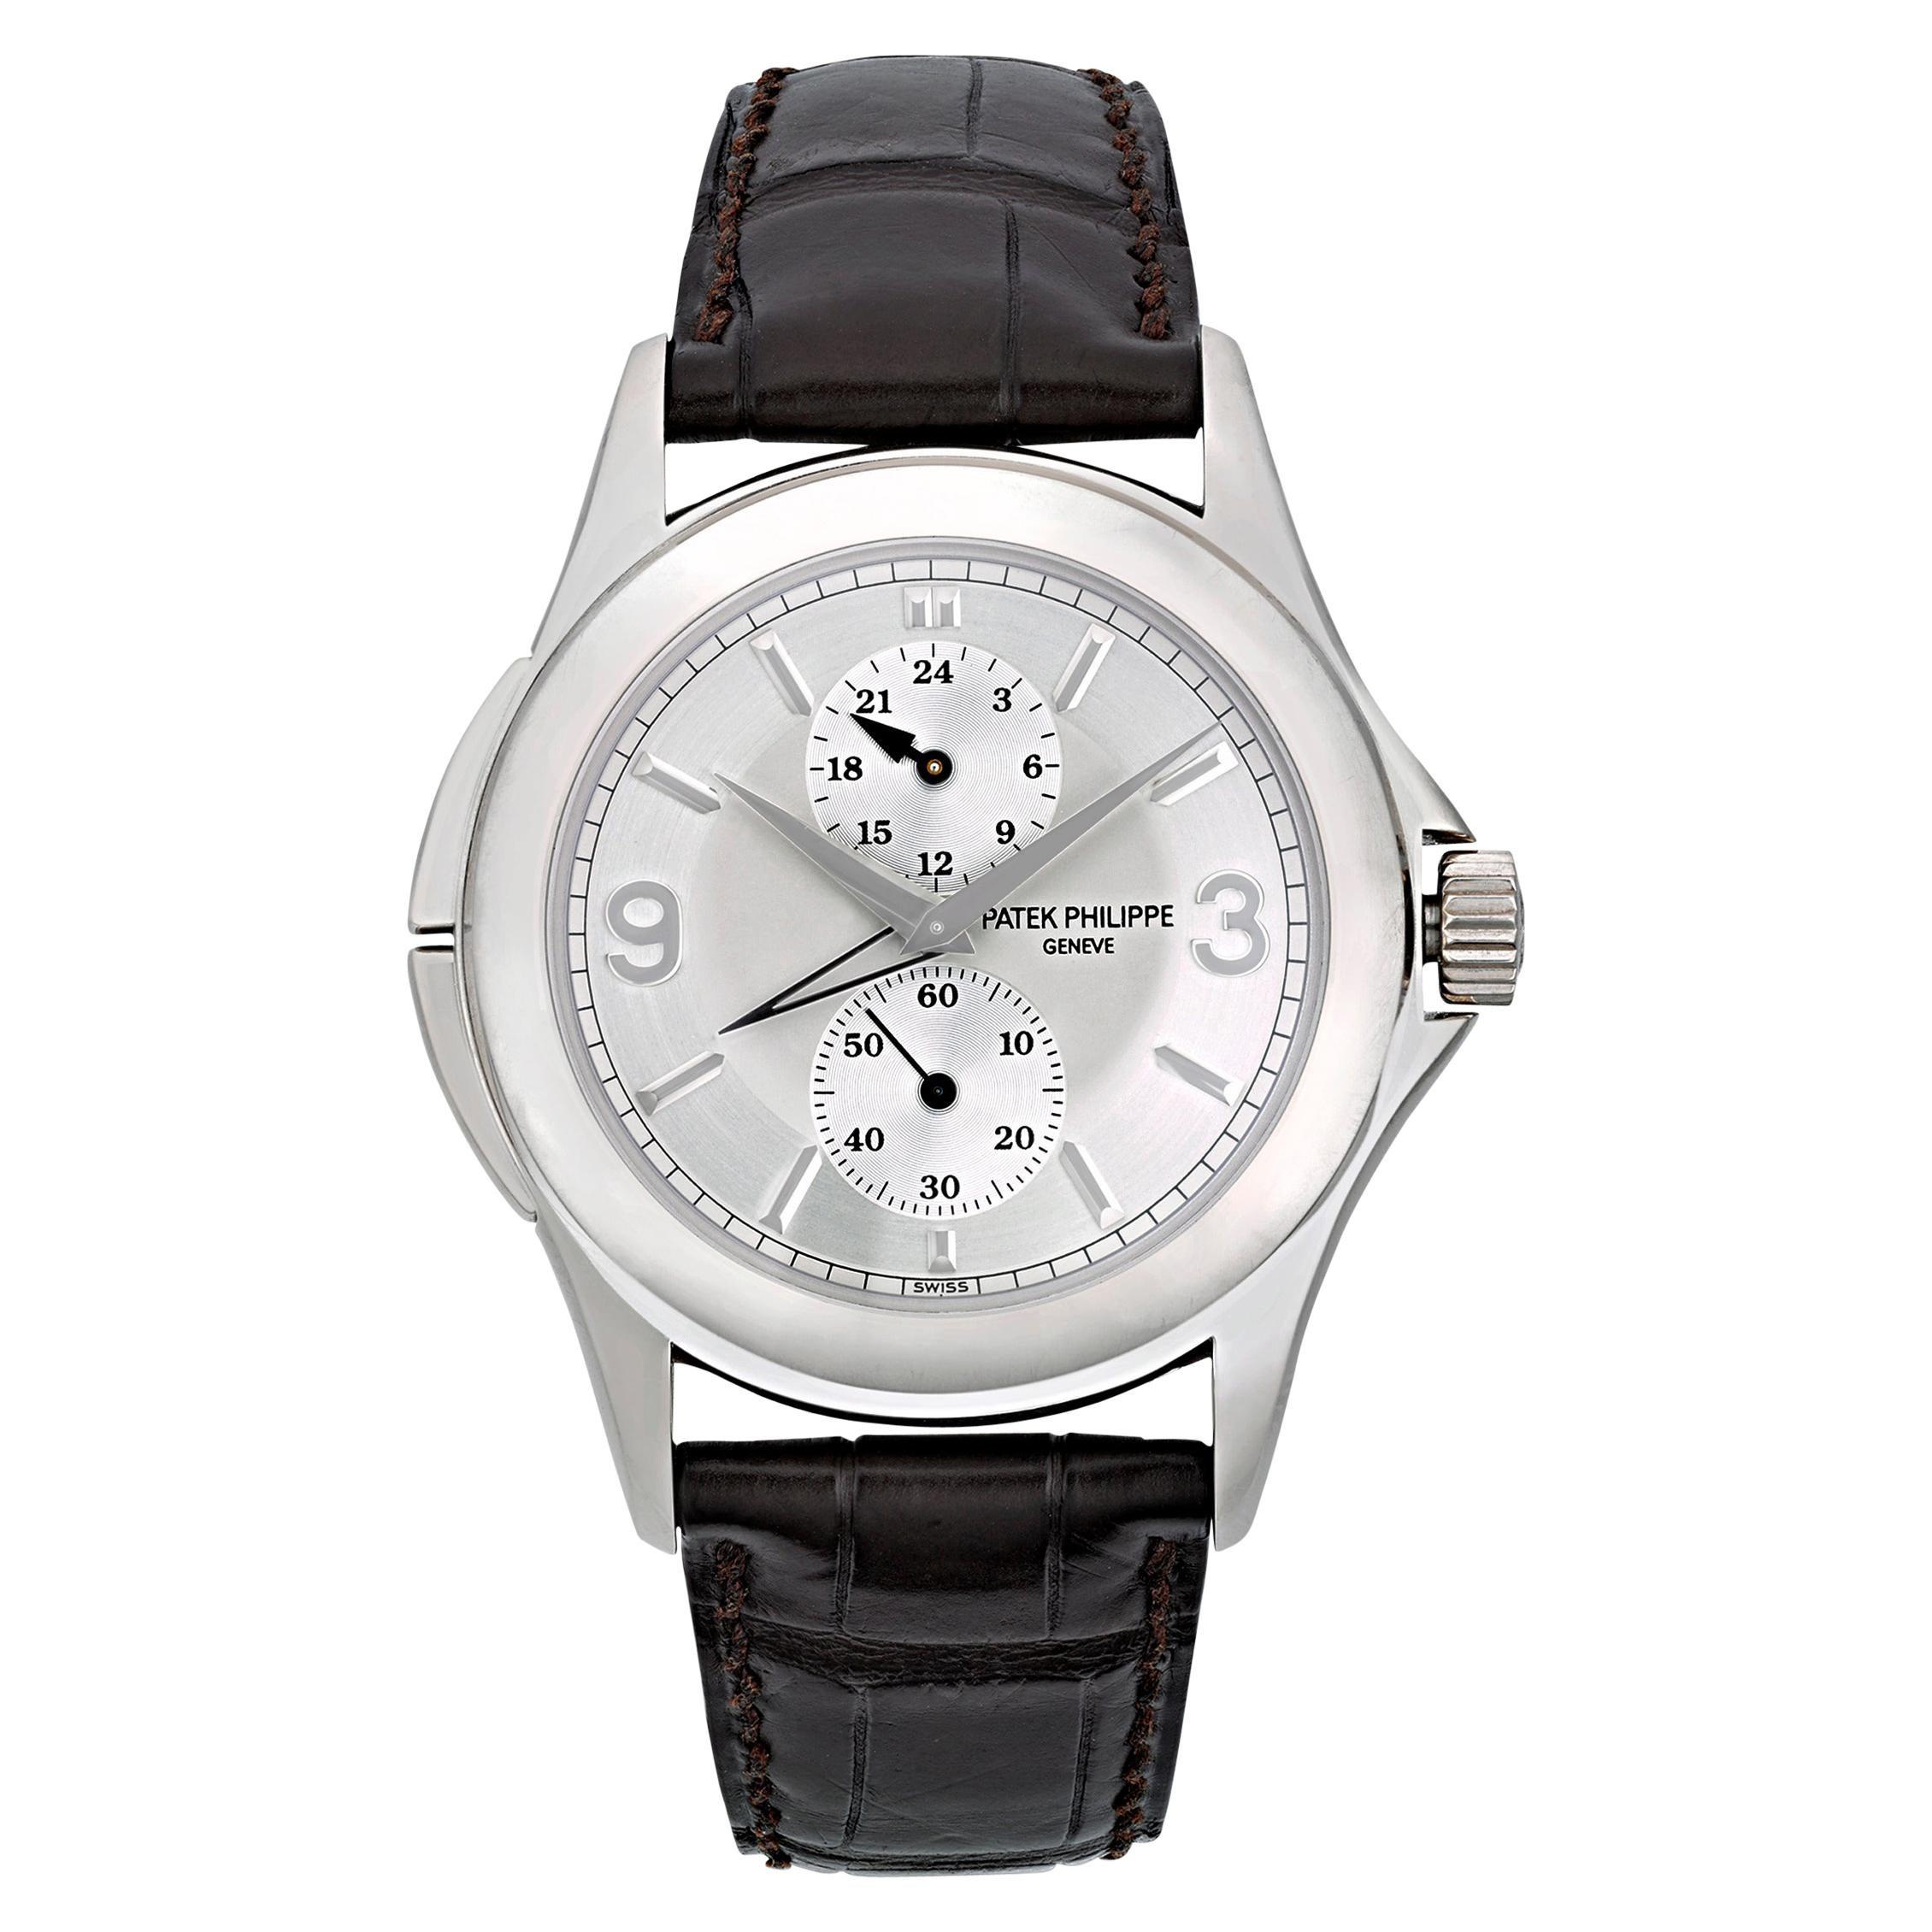 Patek Philippe Travel Time Watch